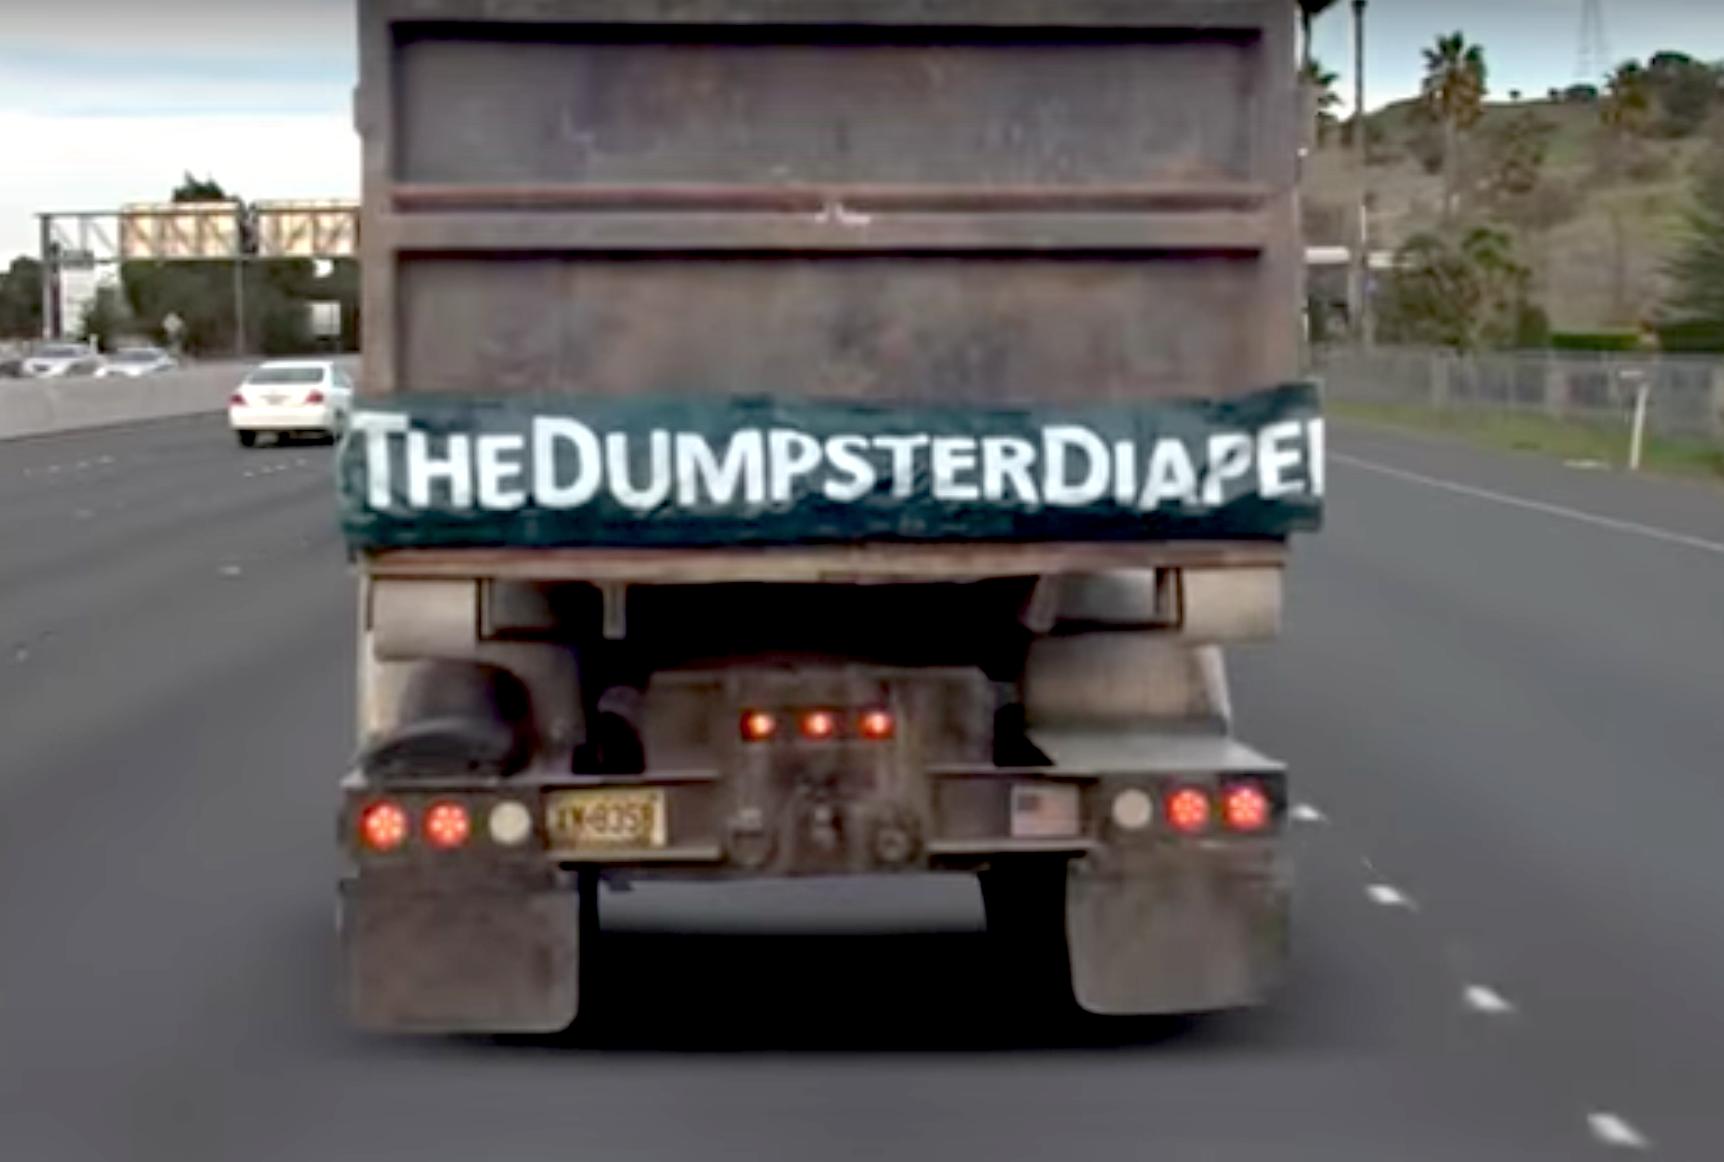 dump truck diaper covers tailgate gap prevents debris damage